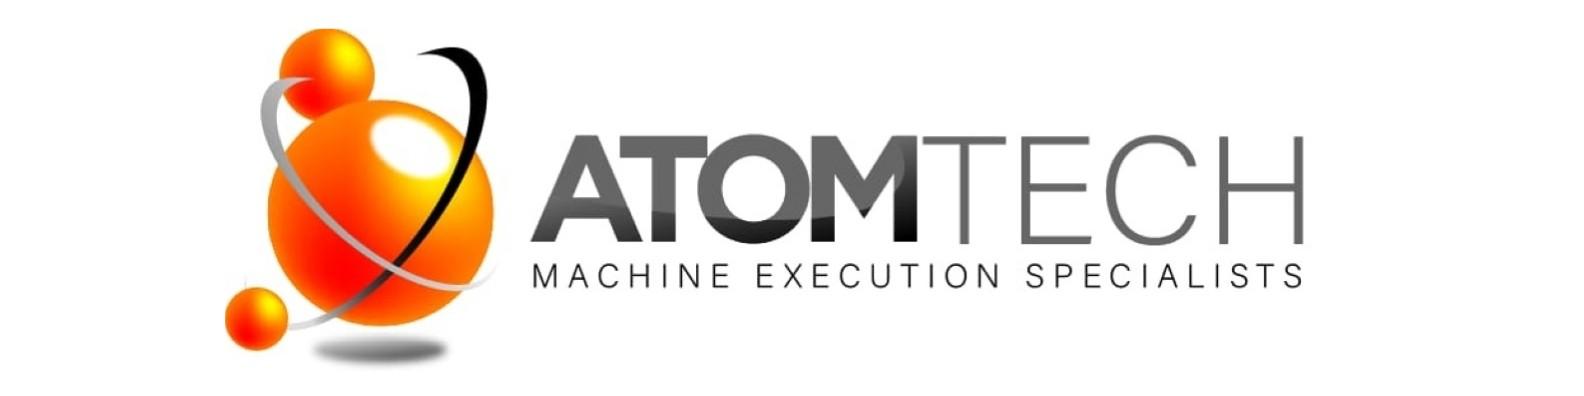 atom tech logo